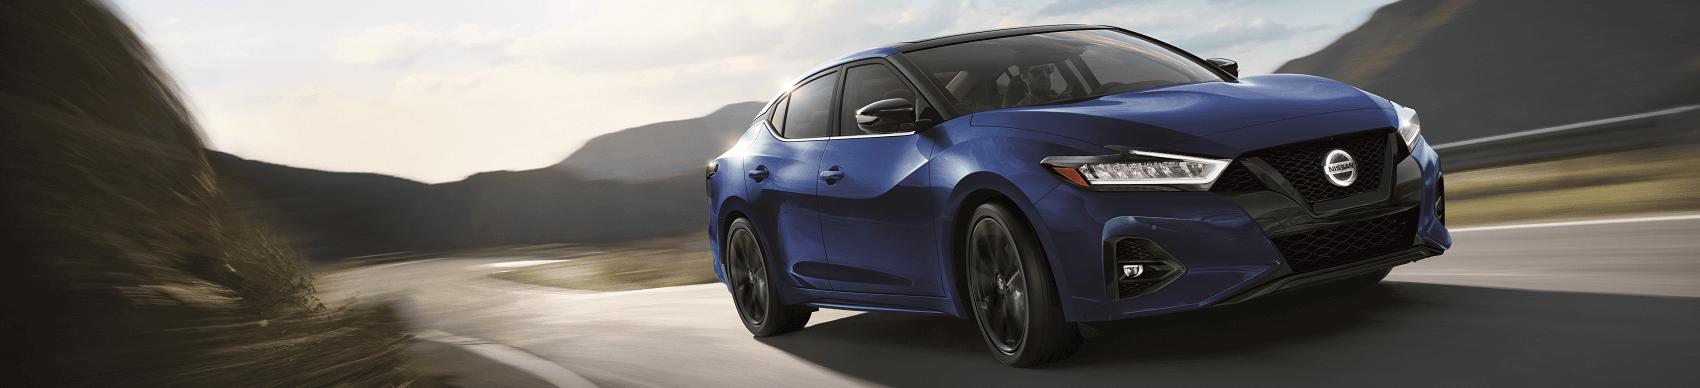 Nissan Maxima Performance Specs